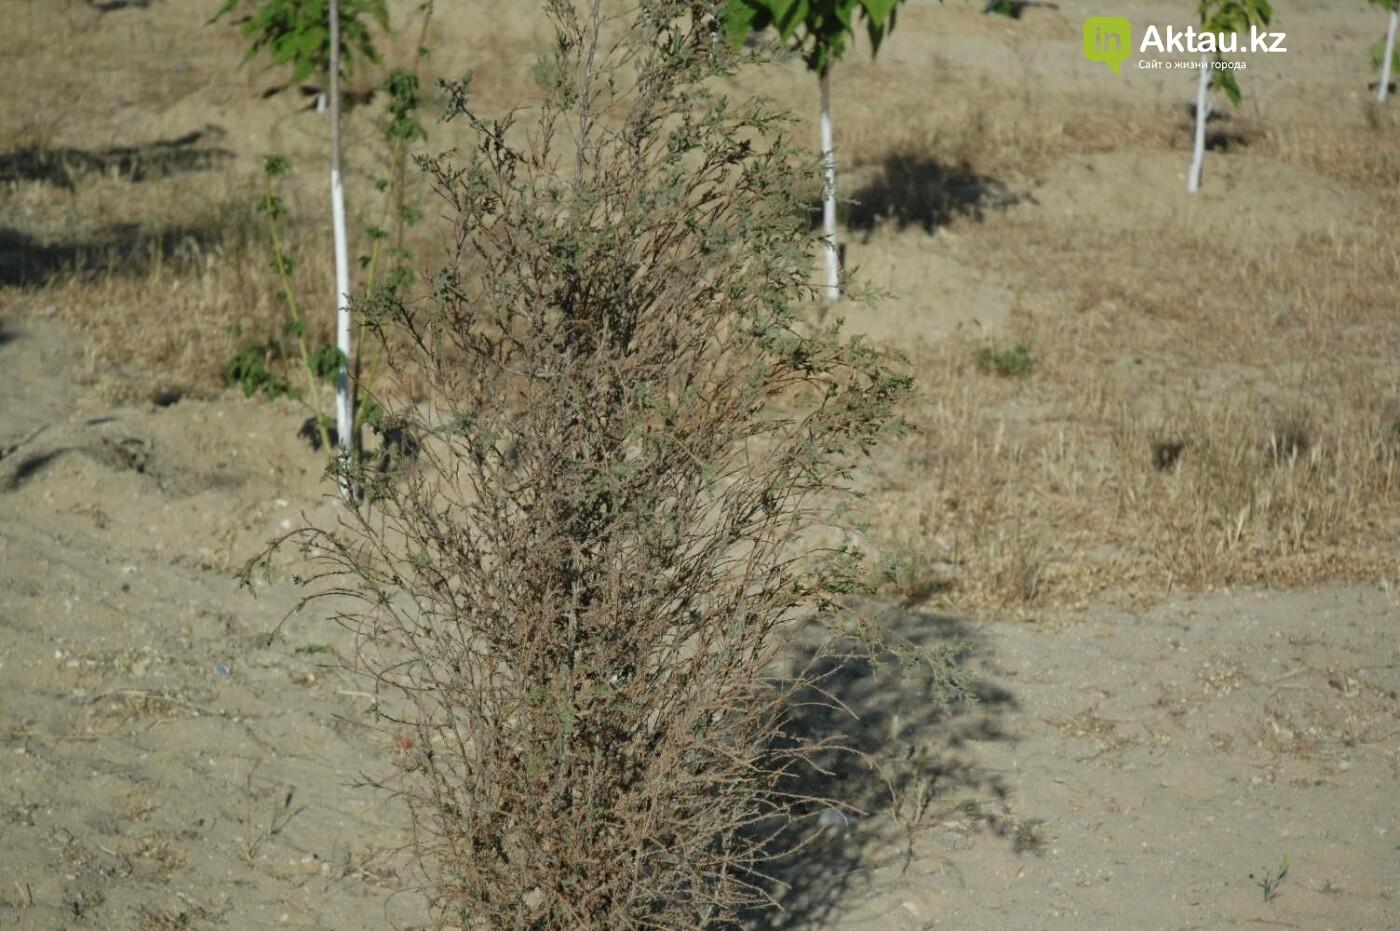 Погибшие от засухи и обезвоживания в Актау исчисляются десятками (ФОТО), фото-14